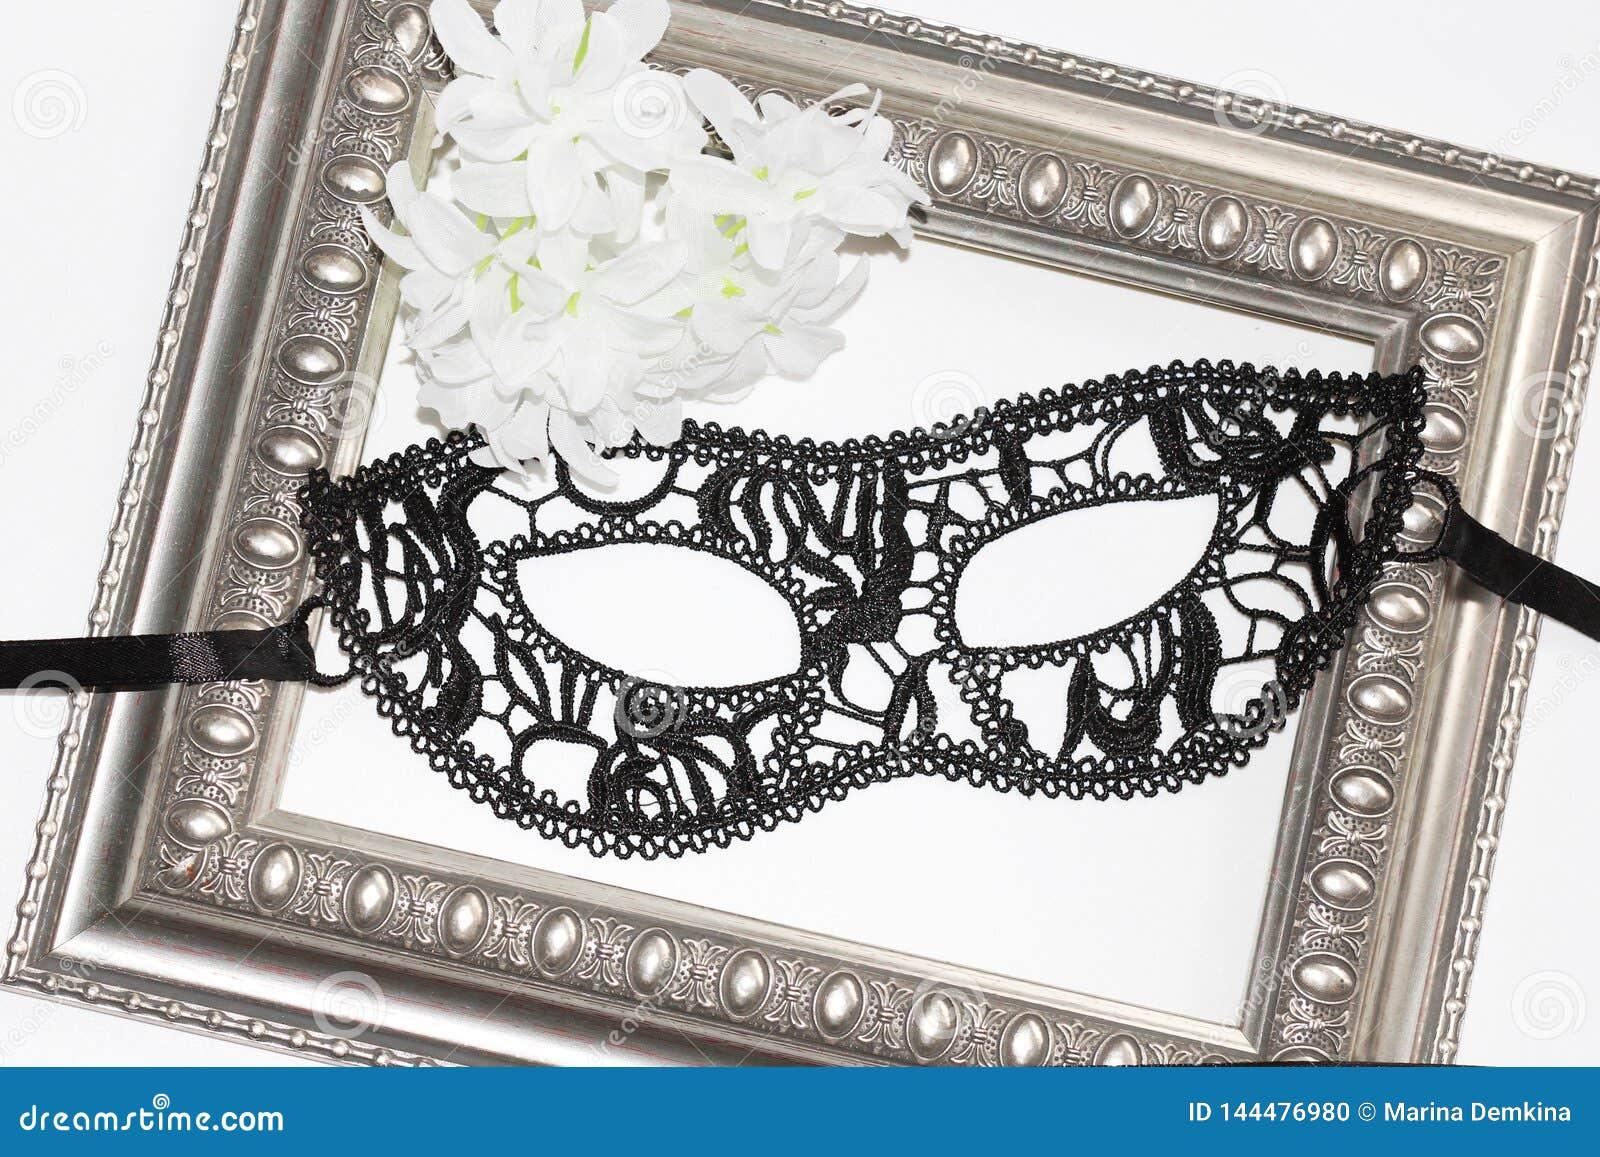 Black lace eye mask, vintage frame and white flowers